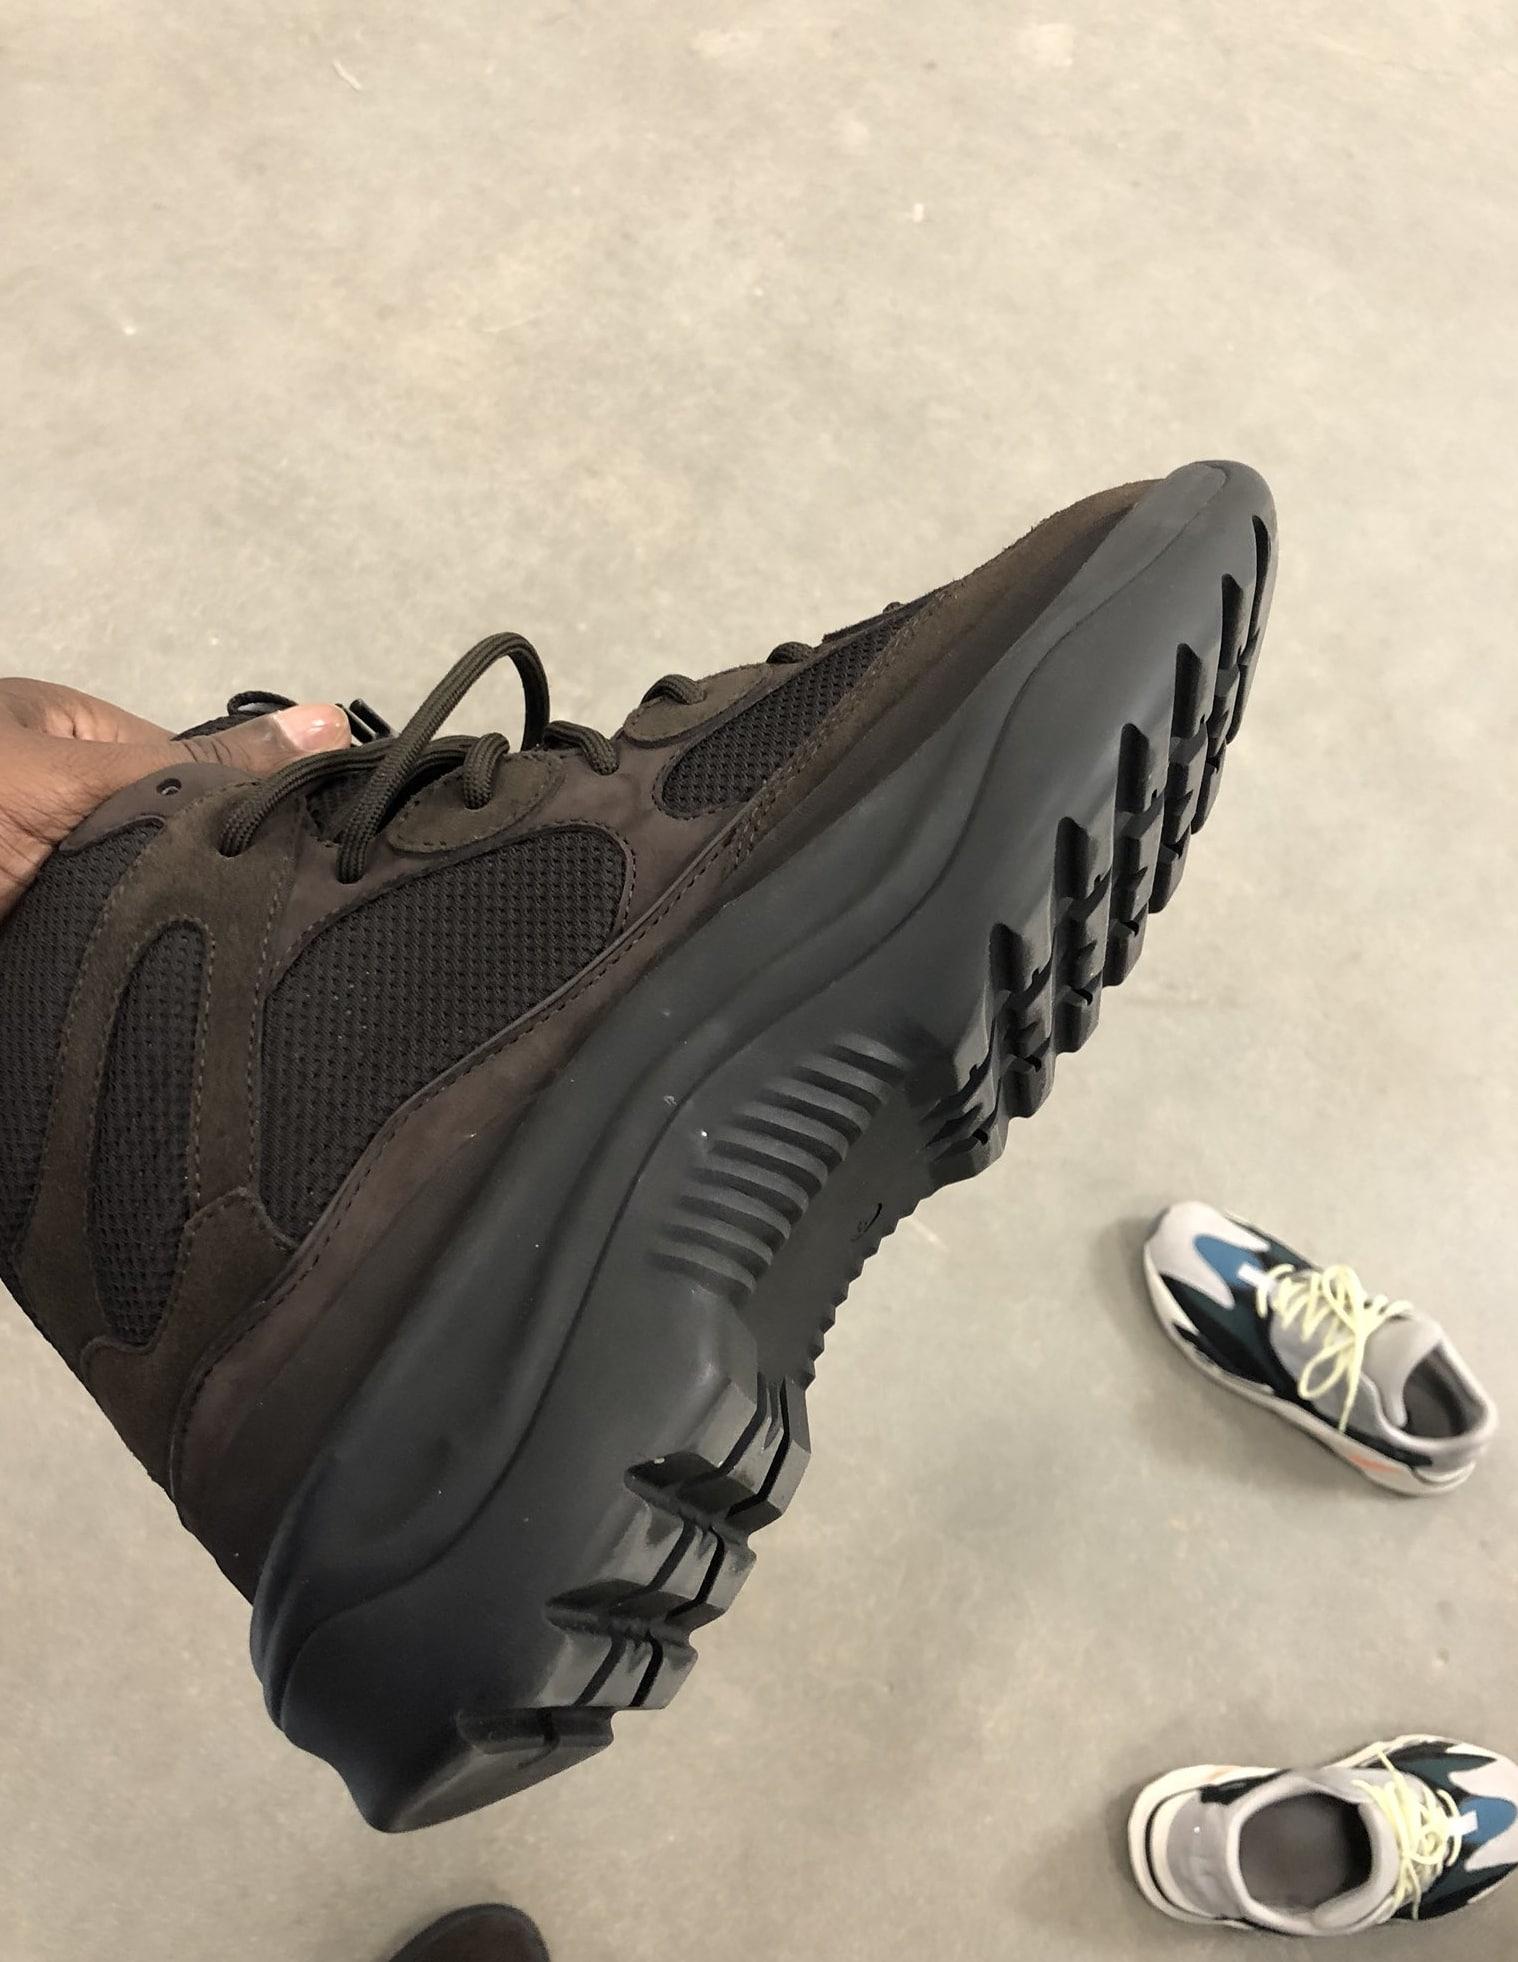 Yeezy Season 6 Desert Rat Boot